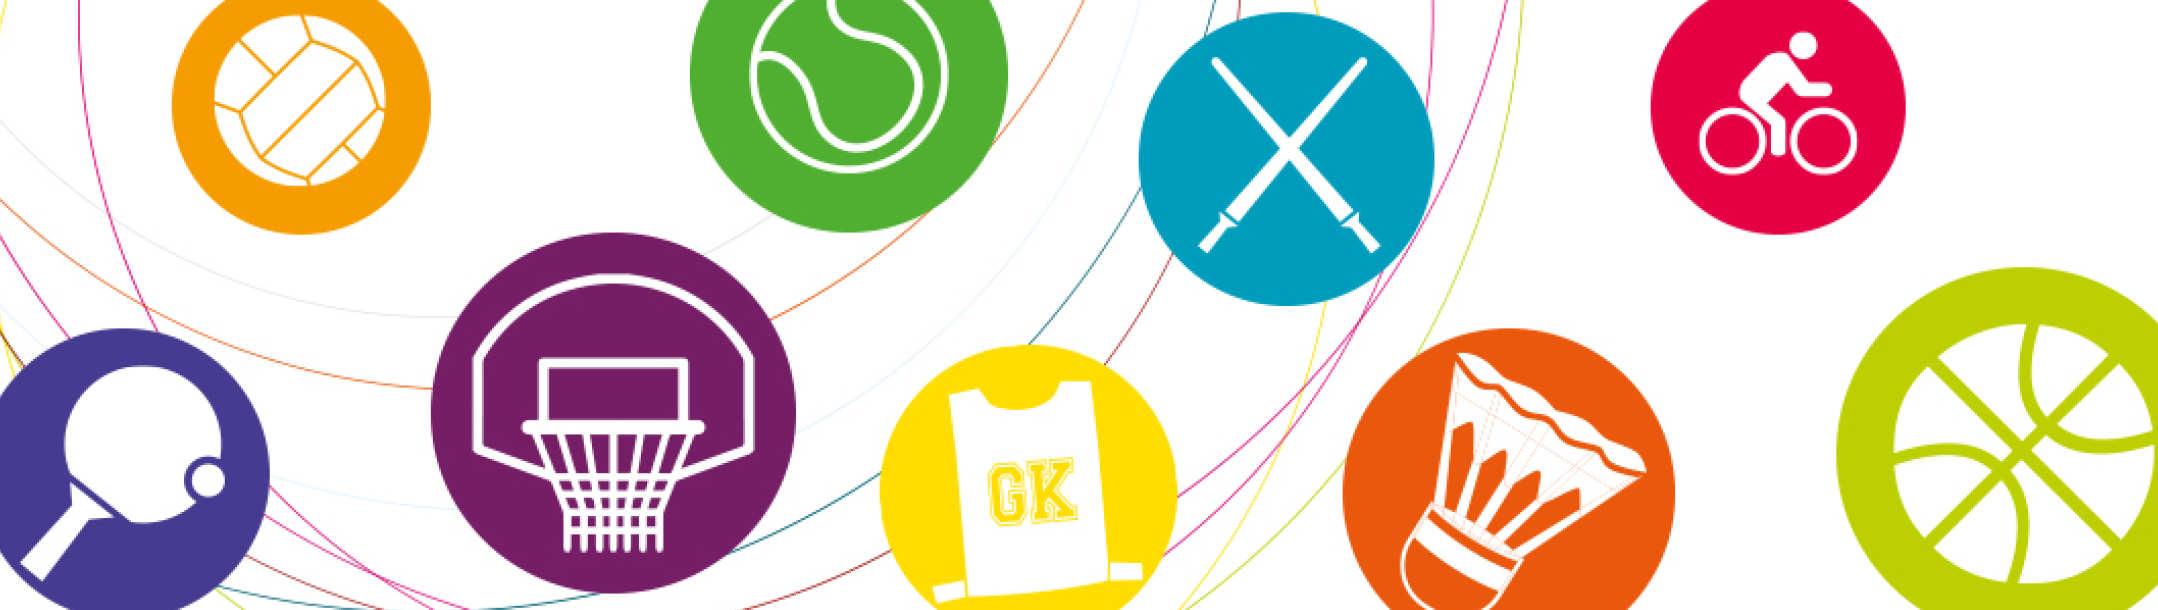 Athletic clipart intramural sport. Sports meet at vet